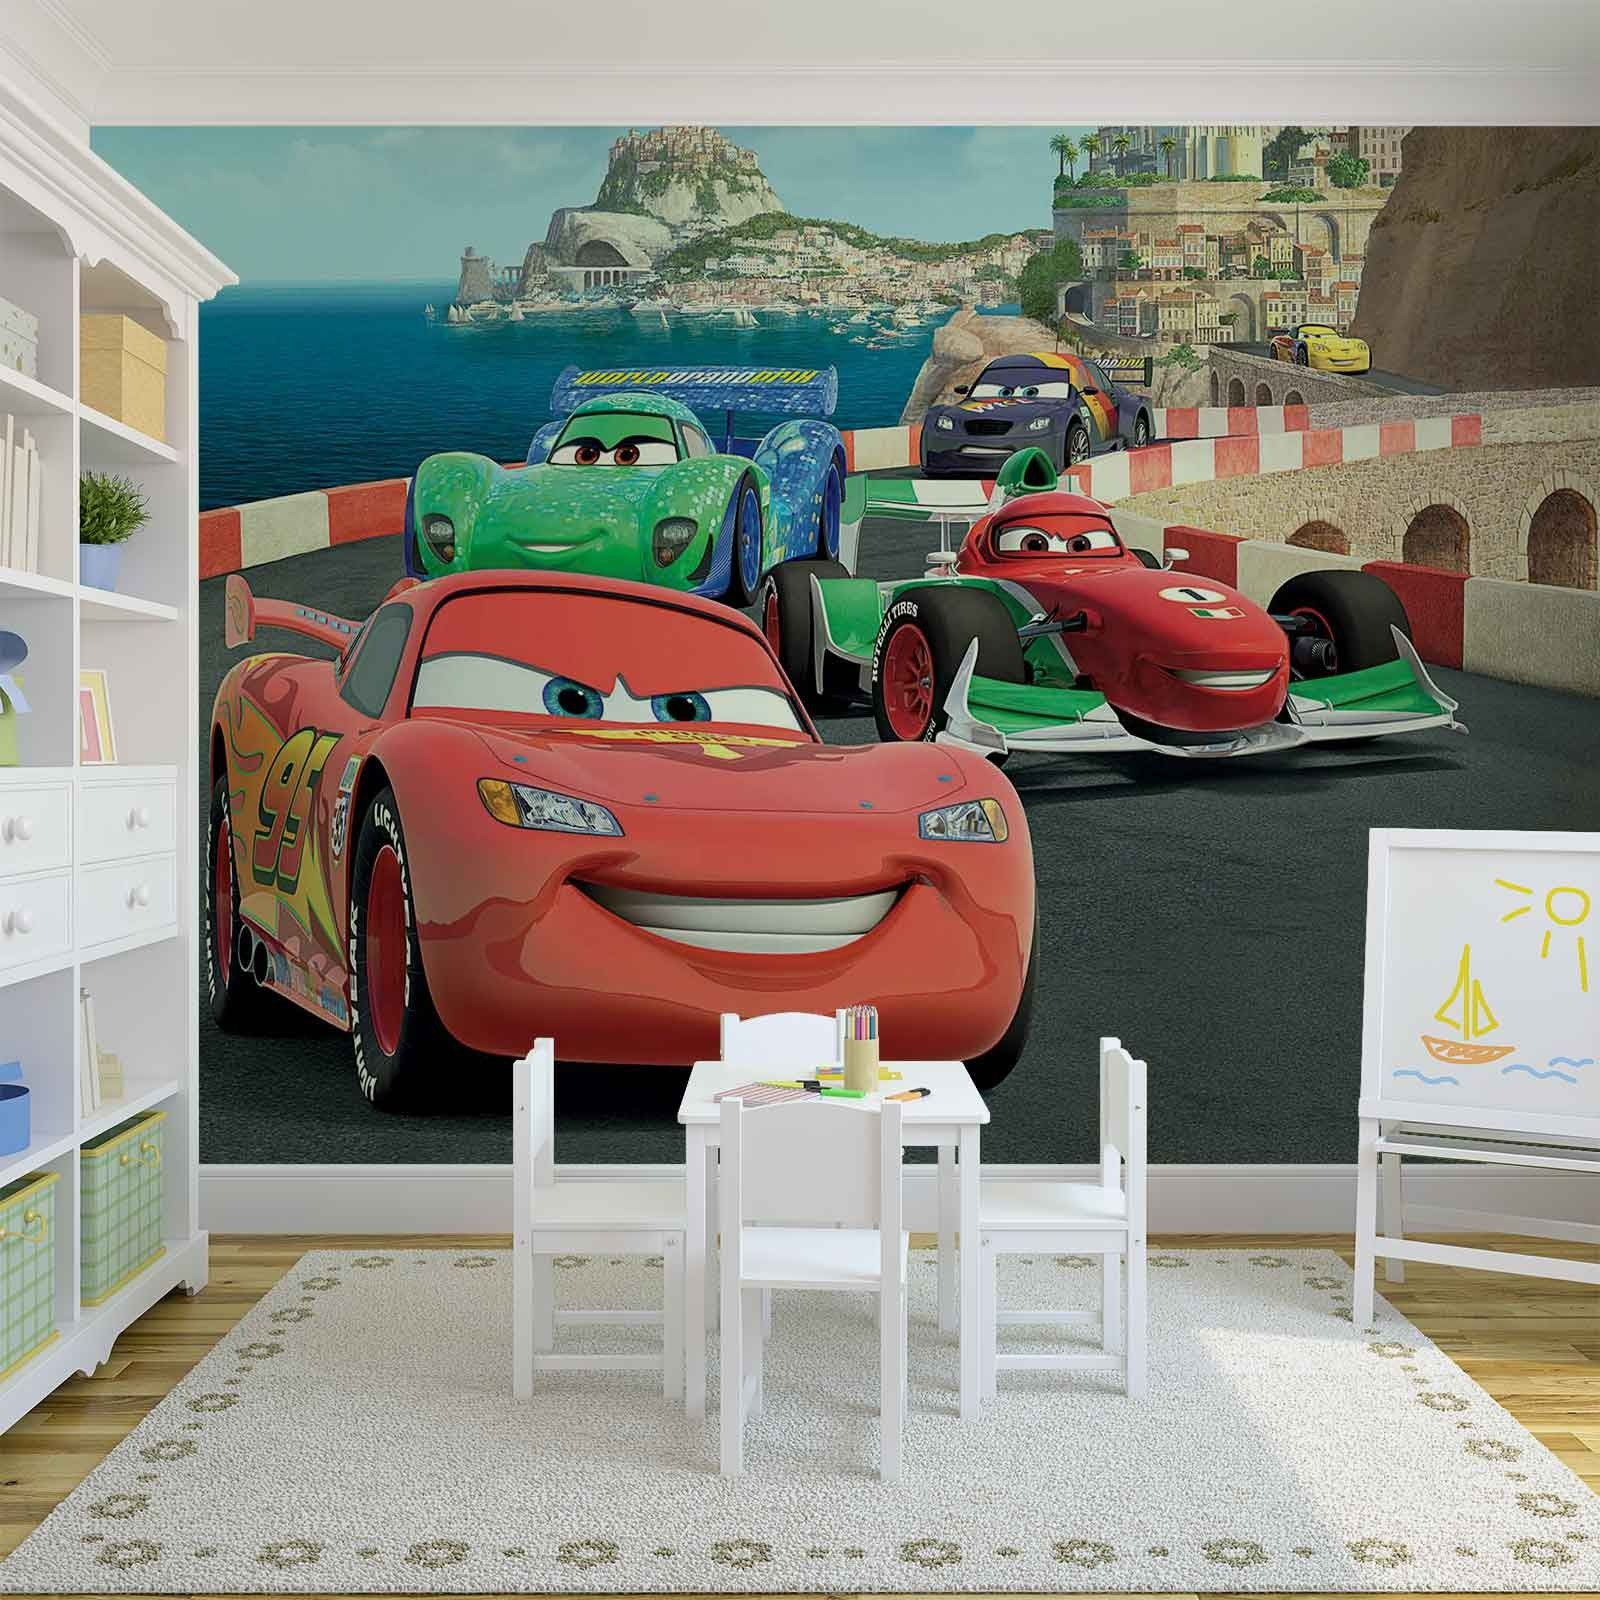 Remove wallpaper in five steps! Disney Cars Wallpaper Uk Disney Cars Wallpaper Uk Cars Wallpaper For Bedroom 1600x1600 Download Hd Wallpaper Wallpapertip